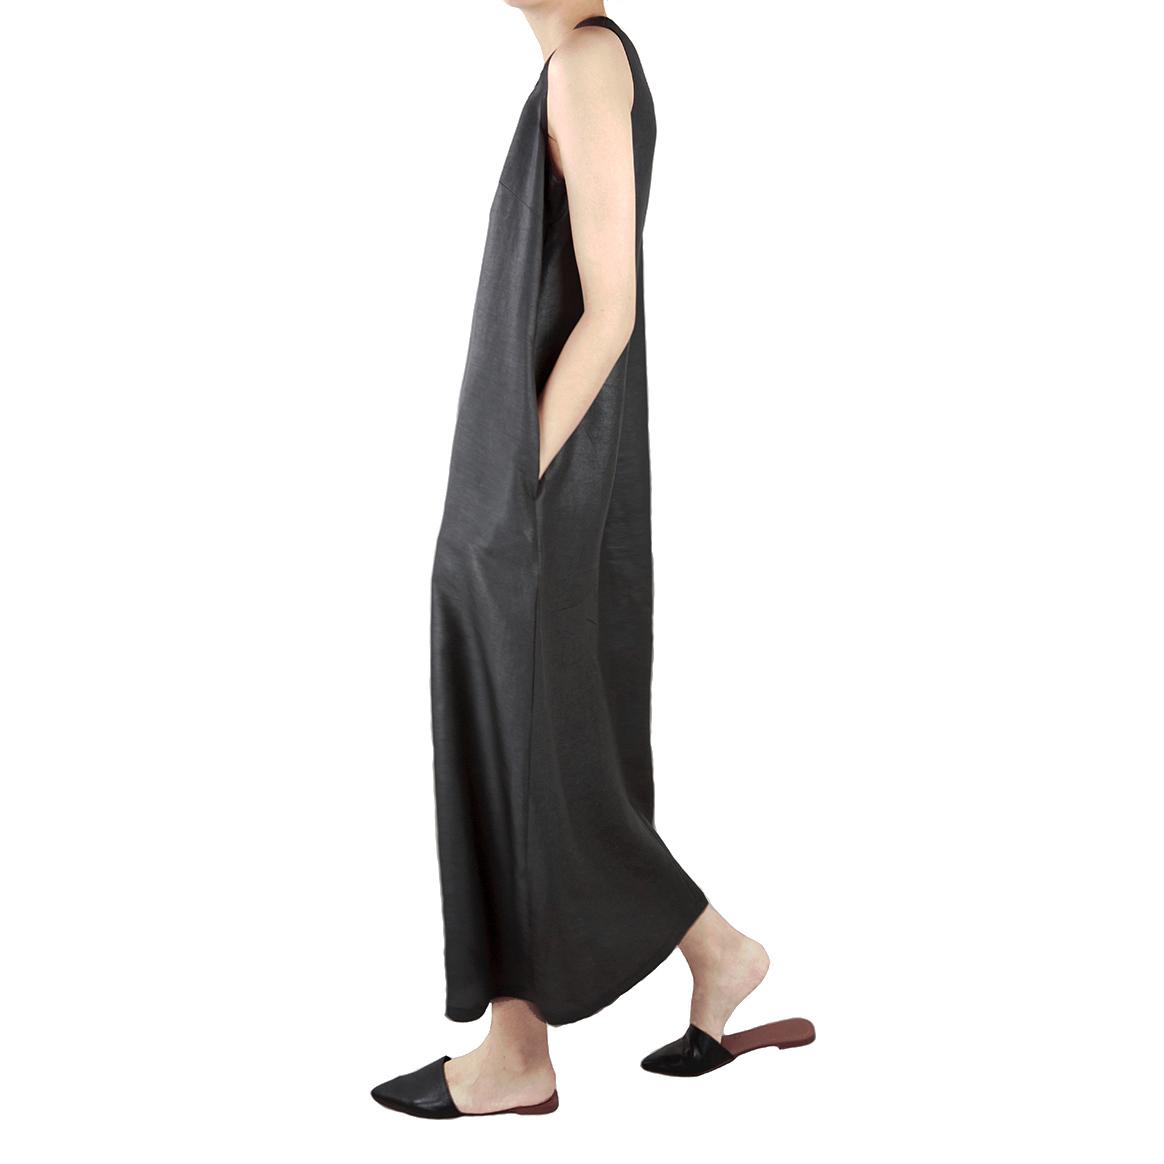 CLEANFLOW原创设计重磅真丝香云纱莨绸无袖背心超长连衣裙宽松